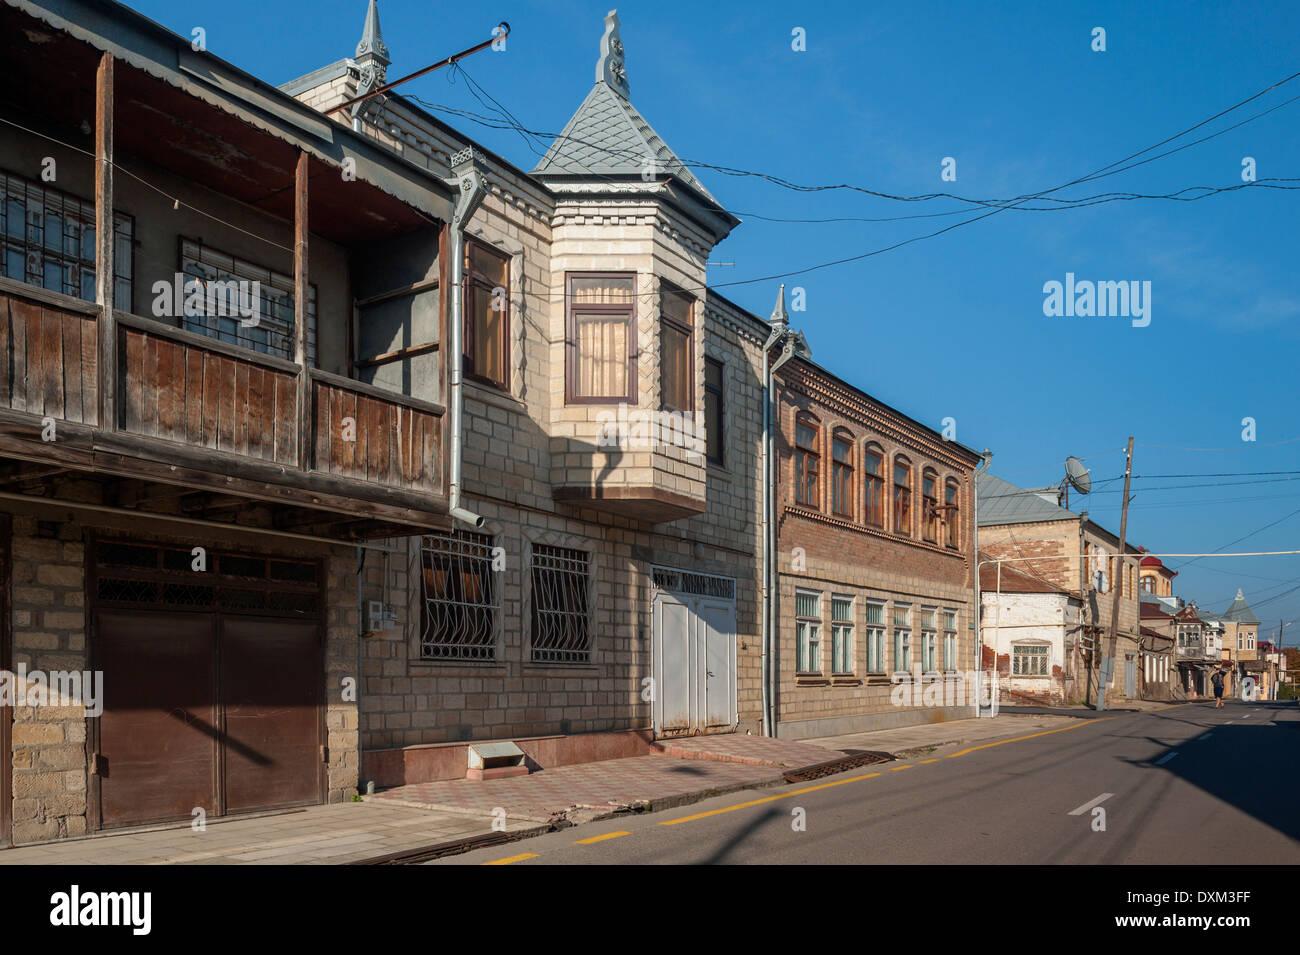 Jewish Town of Quba, Azerbaijan - Stock Image